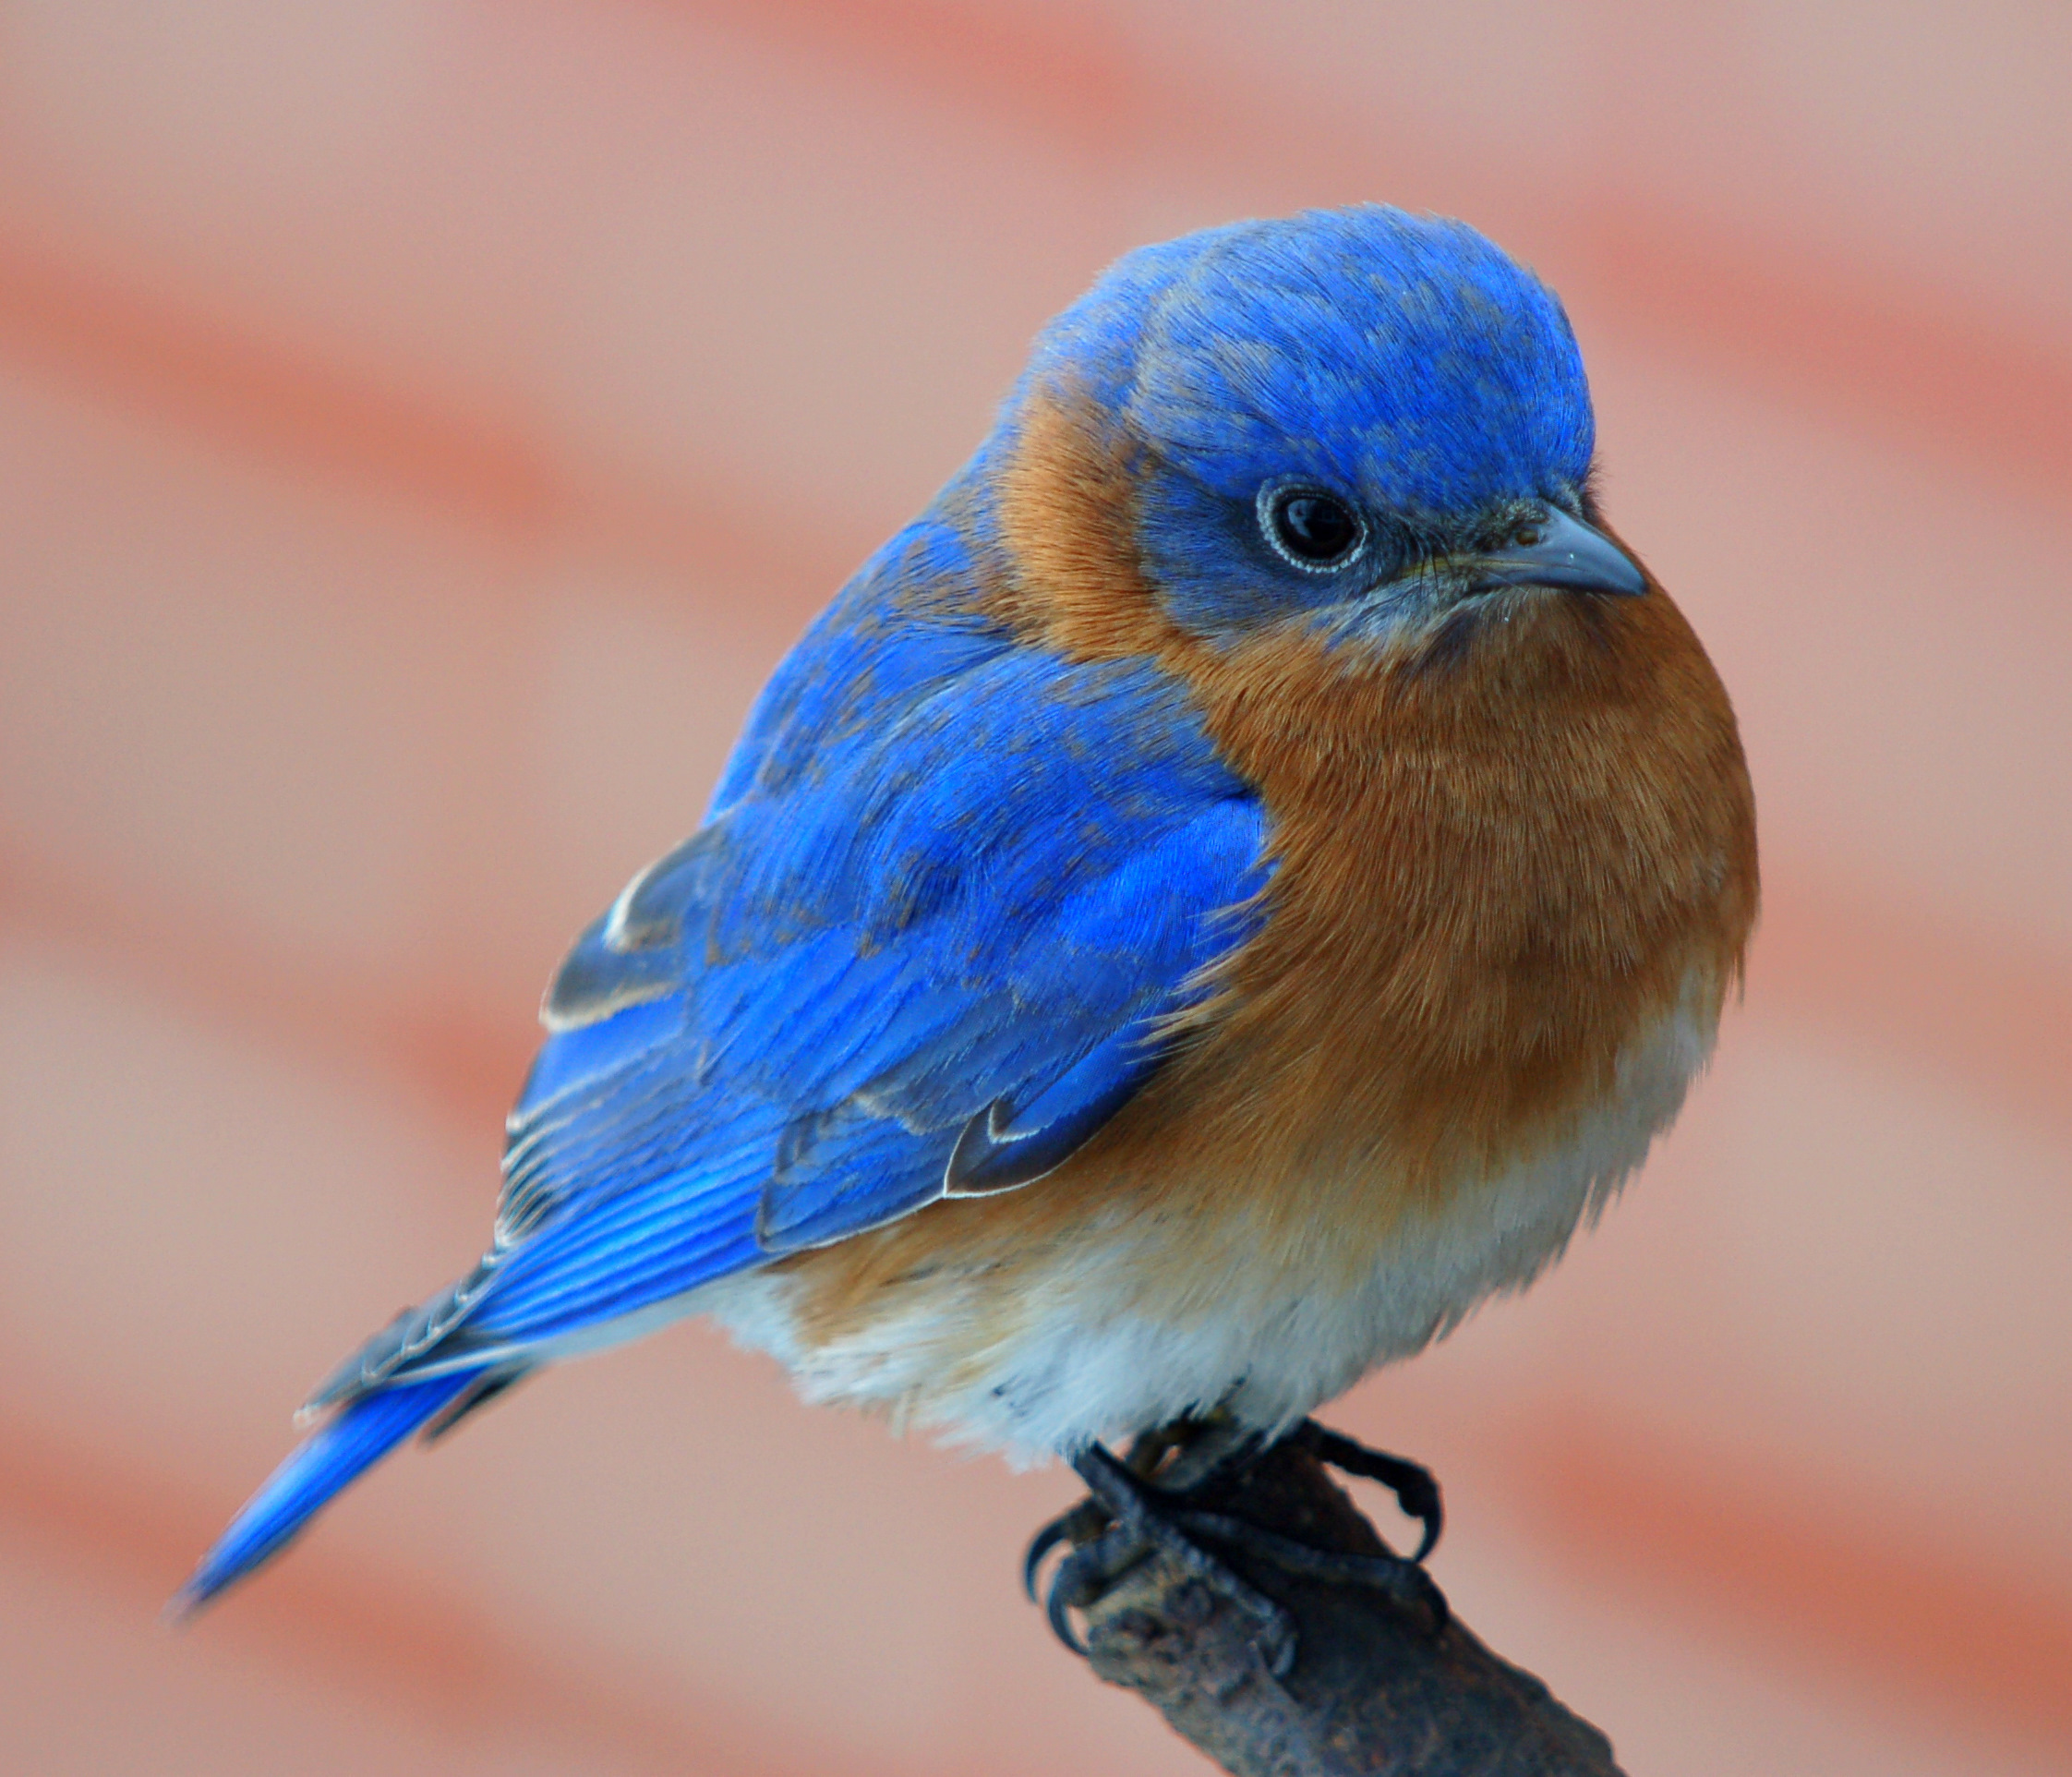 blue bird picture 5945 - hdwpro